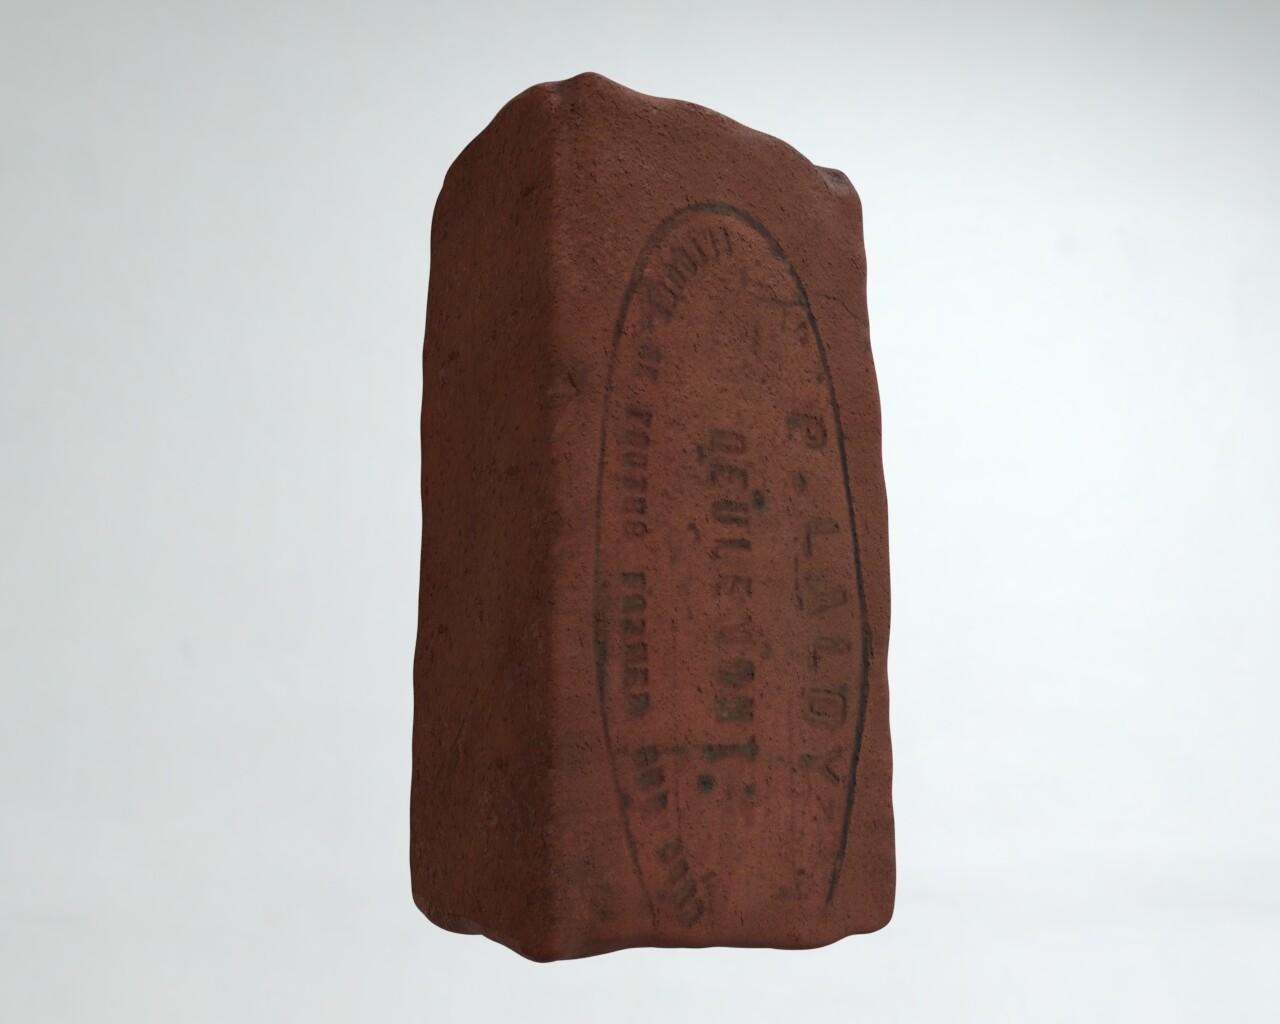 Dig Hill 80: Object 1277, Brick